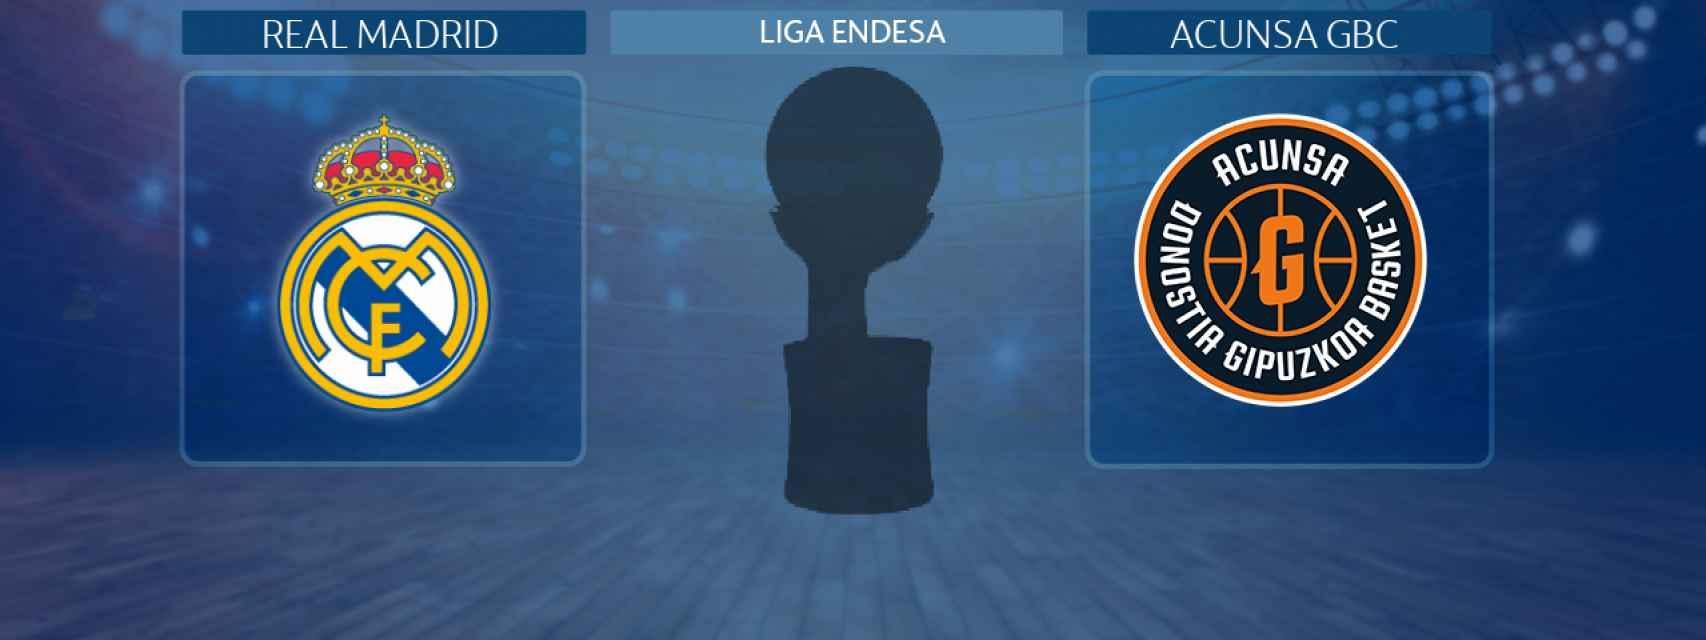 Real Madrid - Acunsa GBC, partido de la Liga Endesa